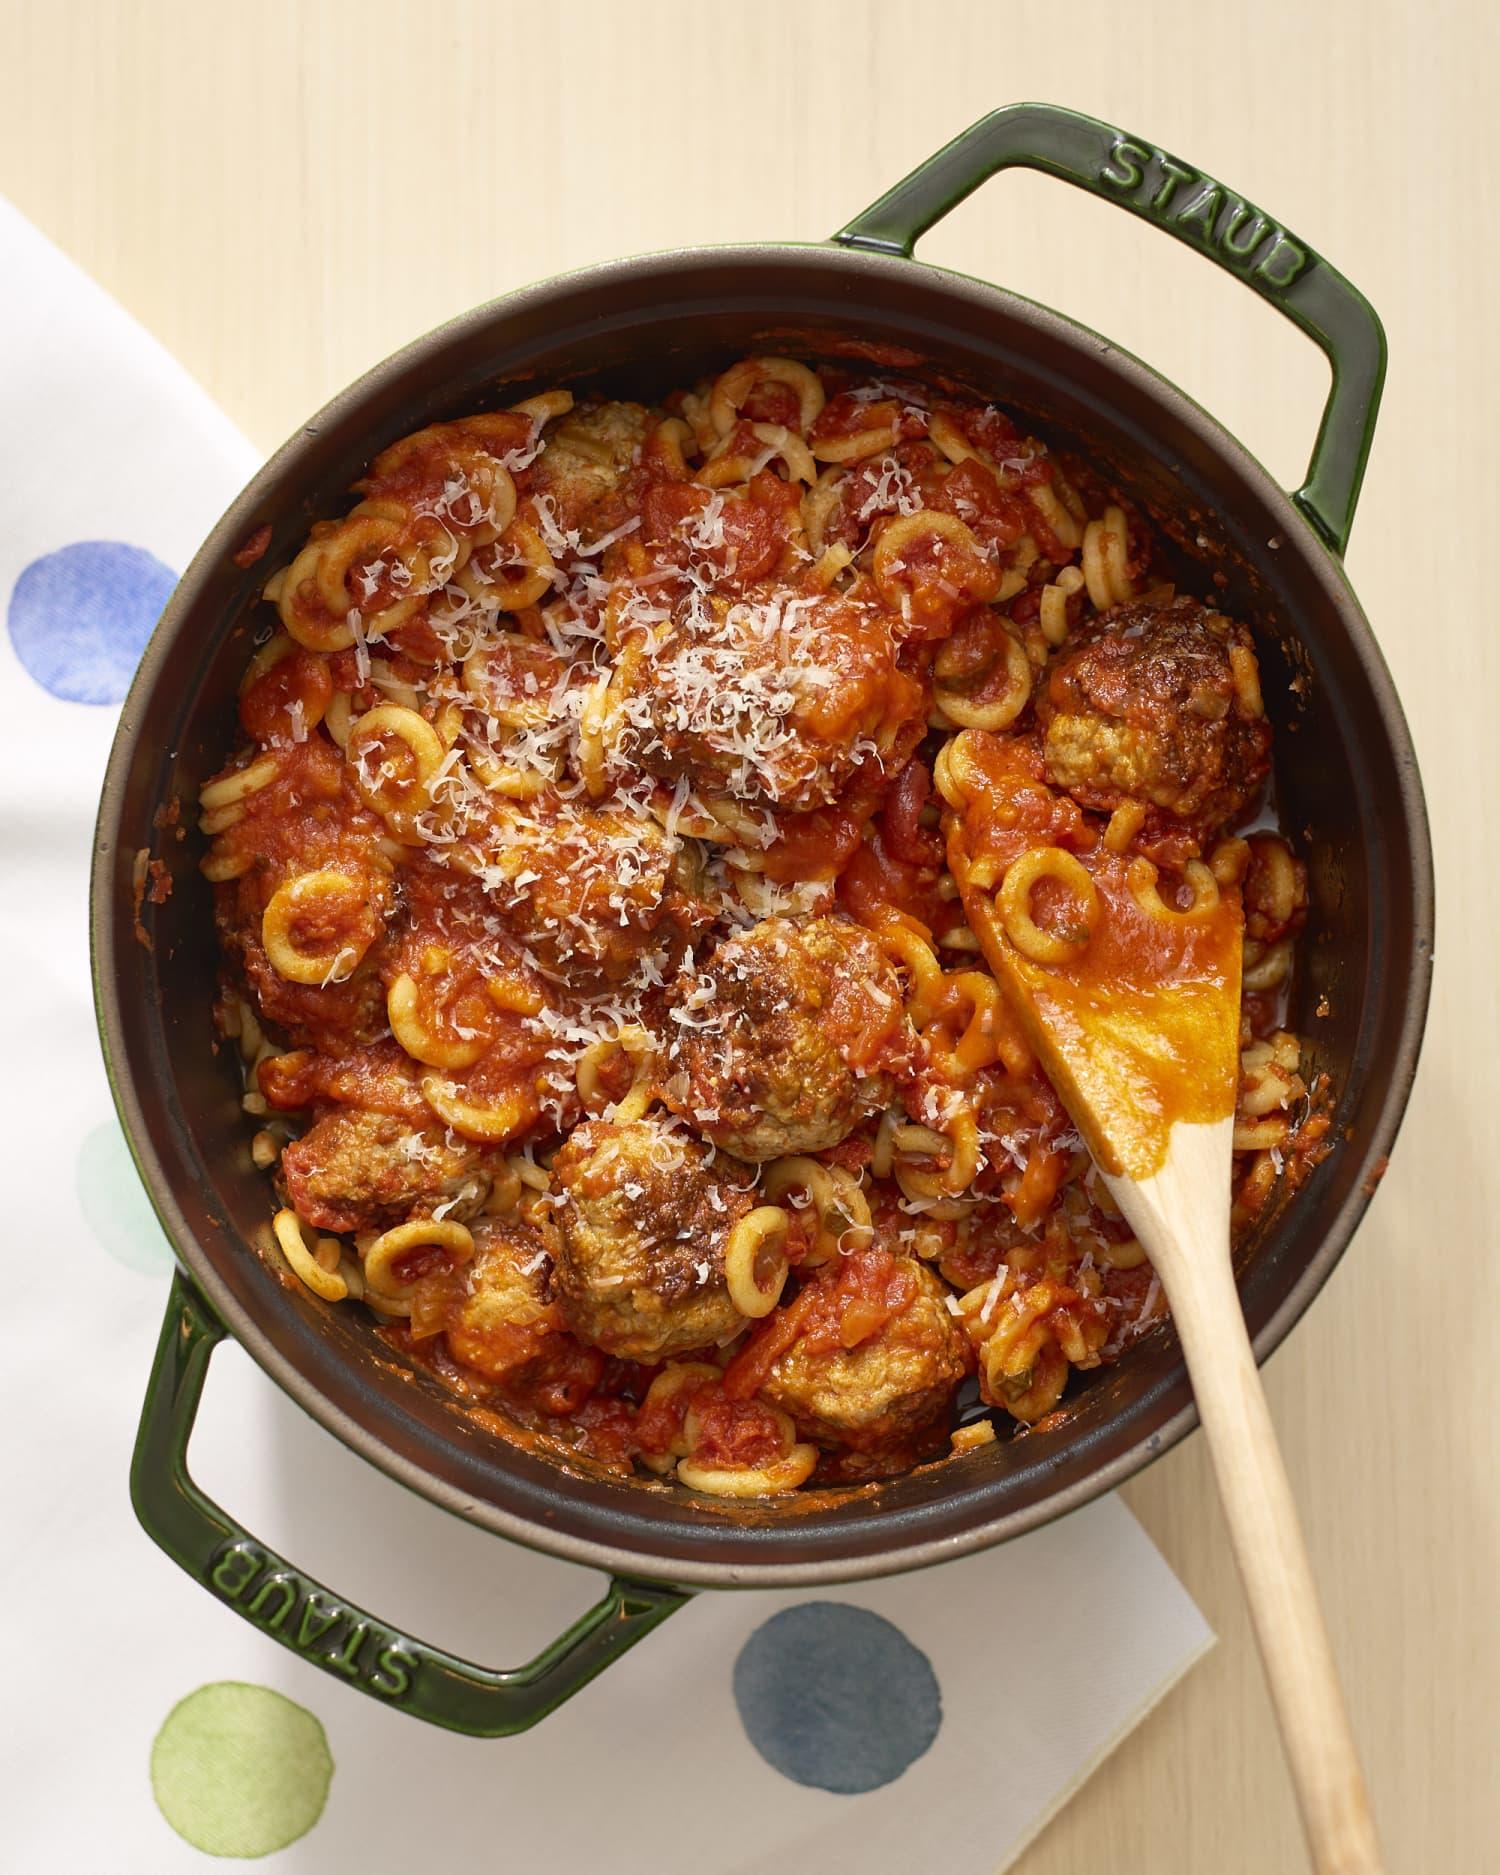 10 Easy Weeknight One-Pot Dinners